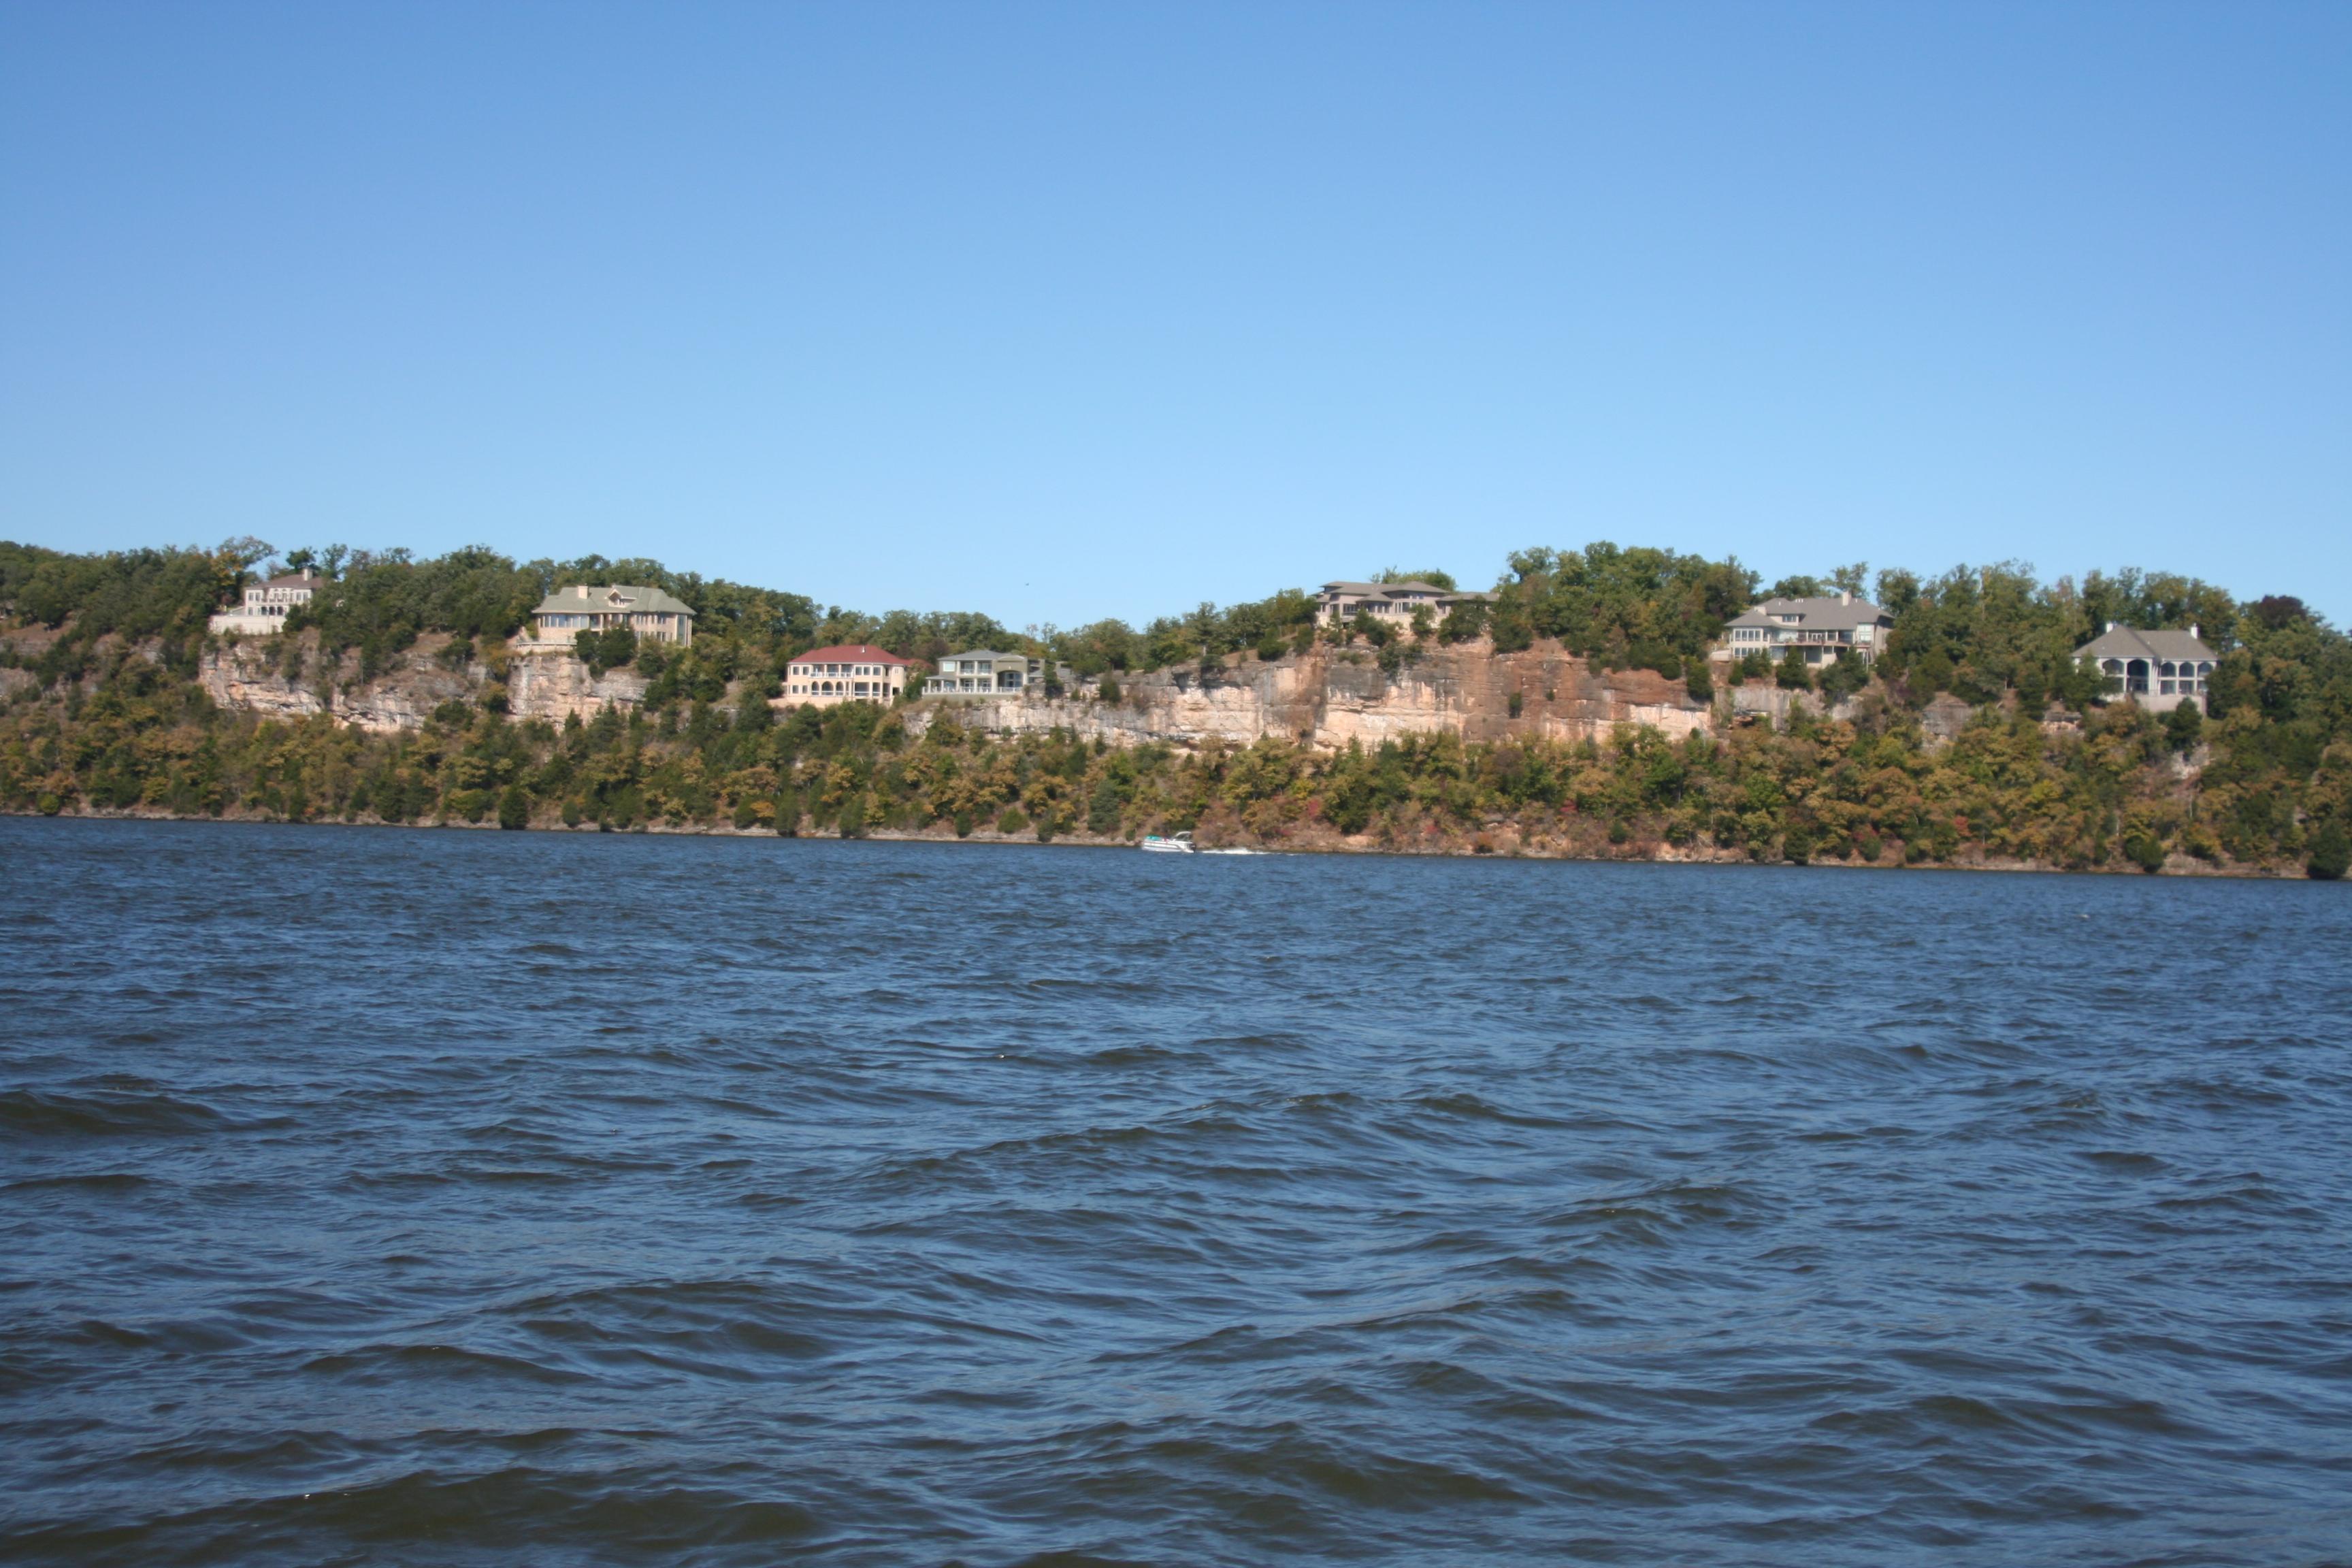 dating lake of the ozarks Choose the site nearest you: columbia / jeff city joplin kansas city kirksville lake of the ozarks southeast missouri springfield st joseph st louis © craigslist cl.